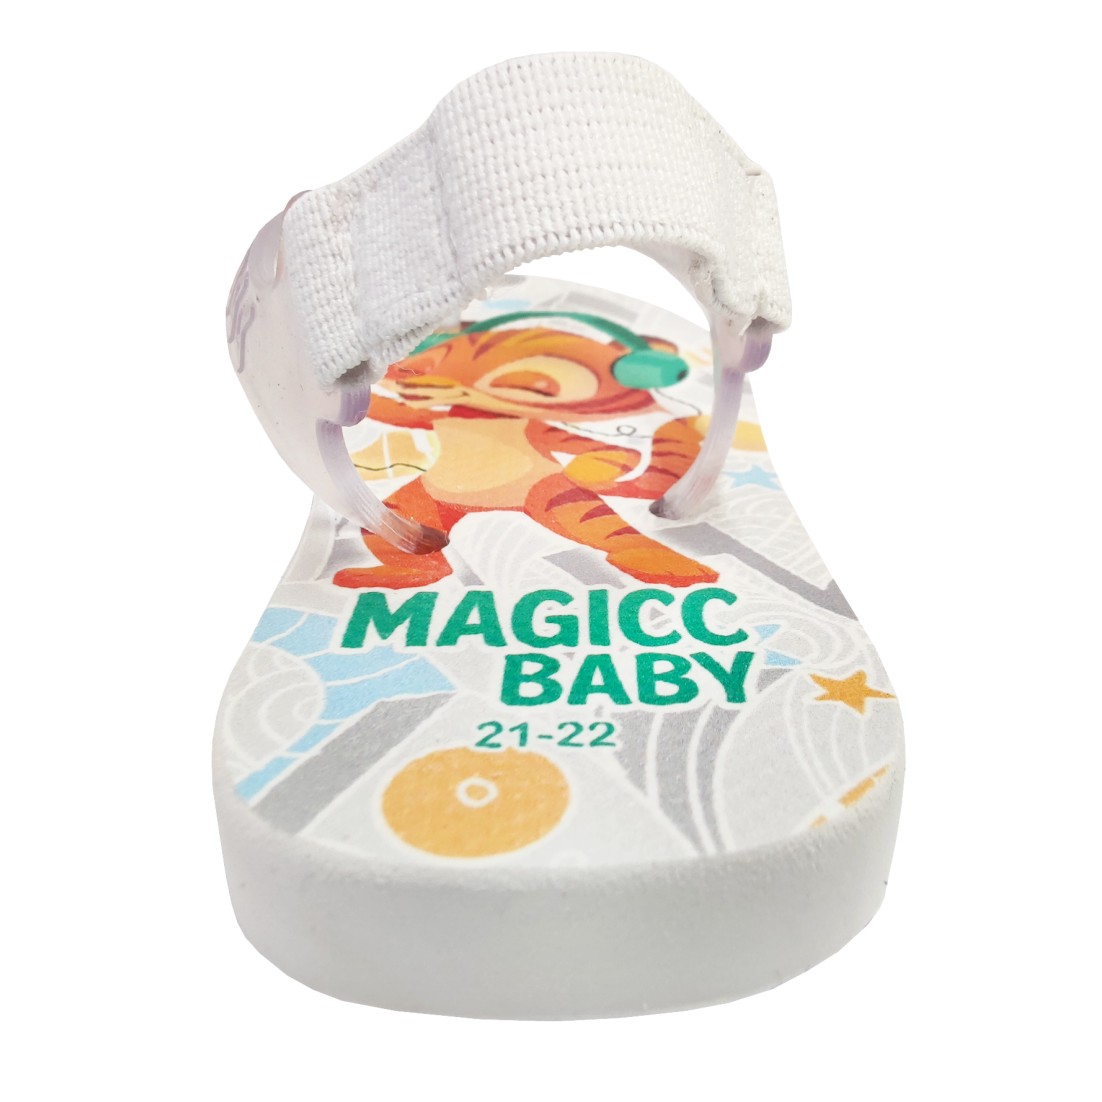 Chinelo Menino Bebê Sandália Tigre Fone de Ouvido Magicc Baby